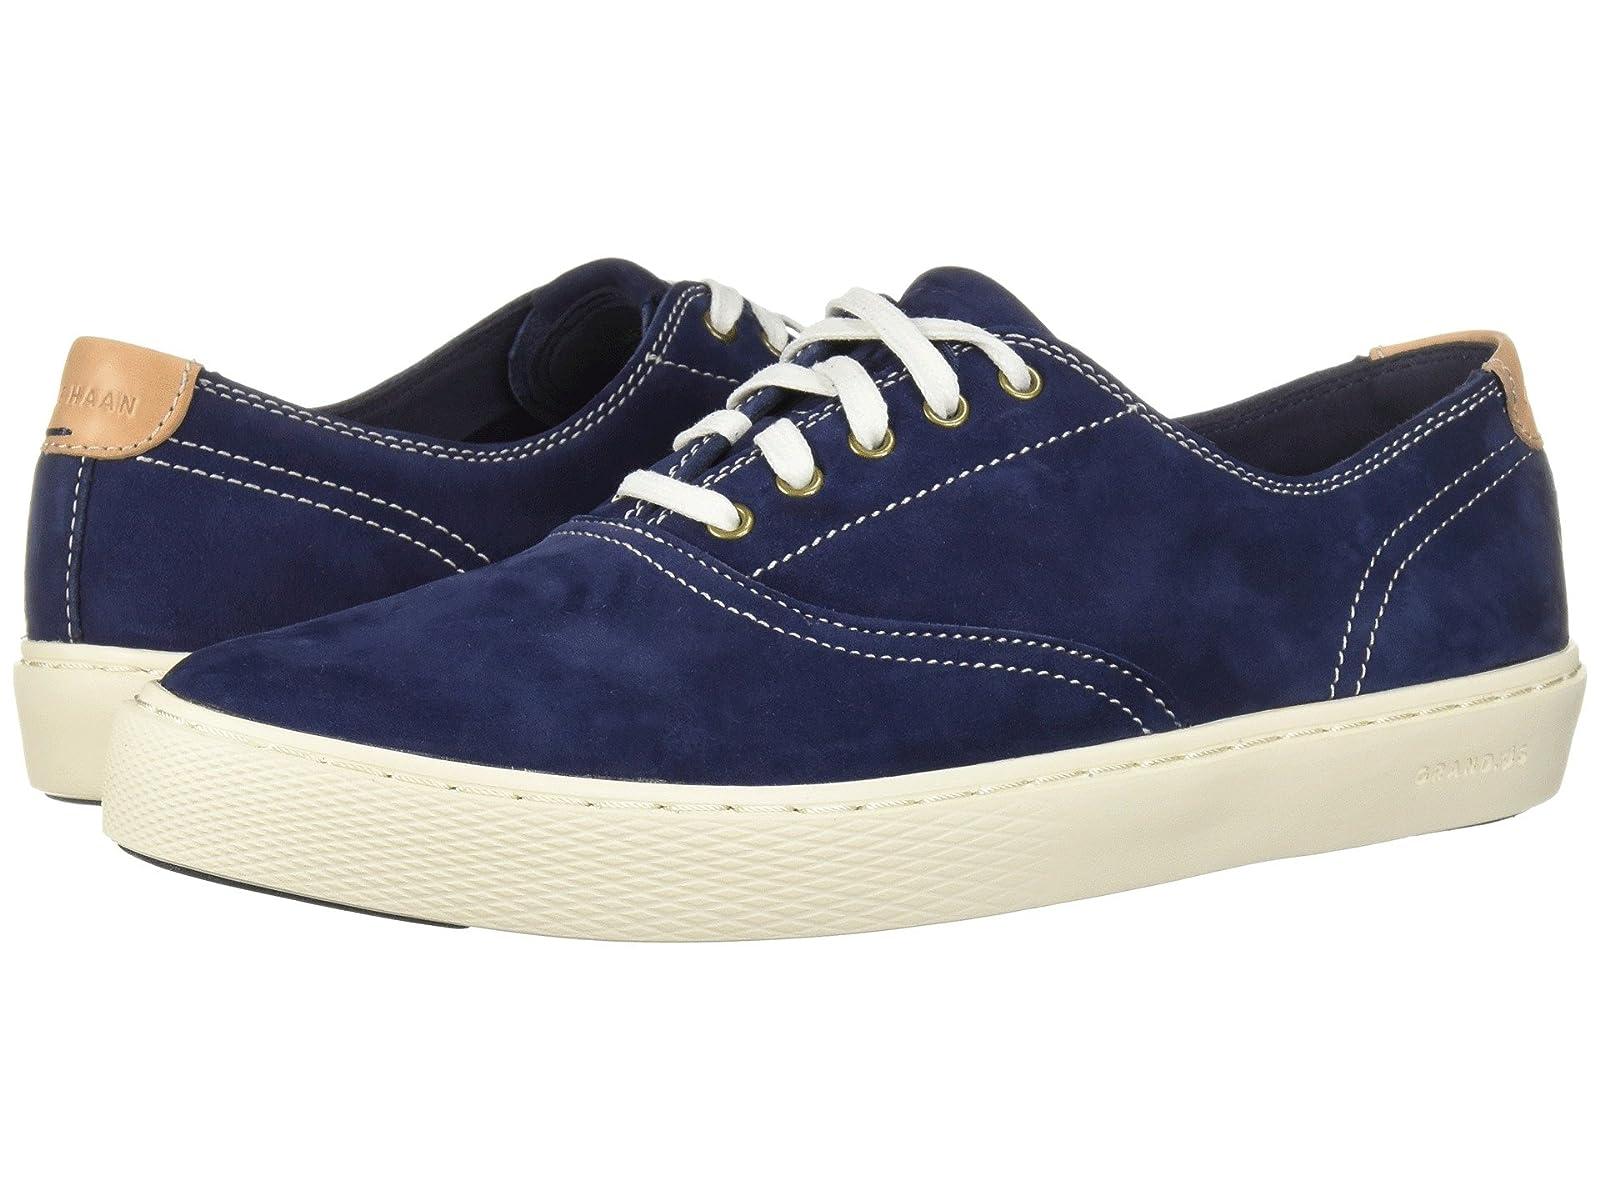 Cole Haan Grandpro Deck OxfordAtmospheric grades have affordable shoes